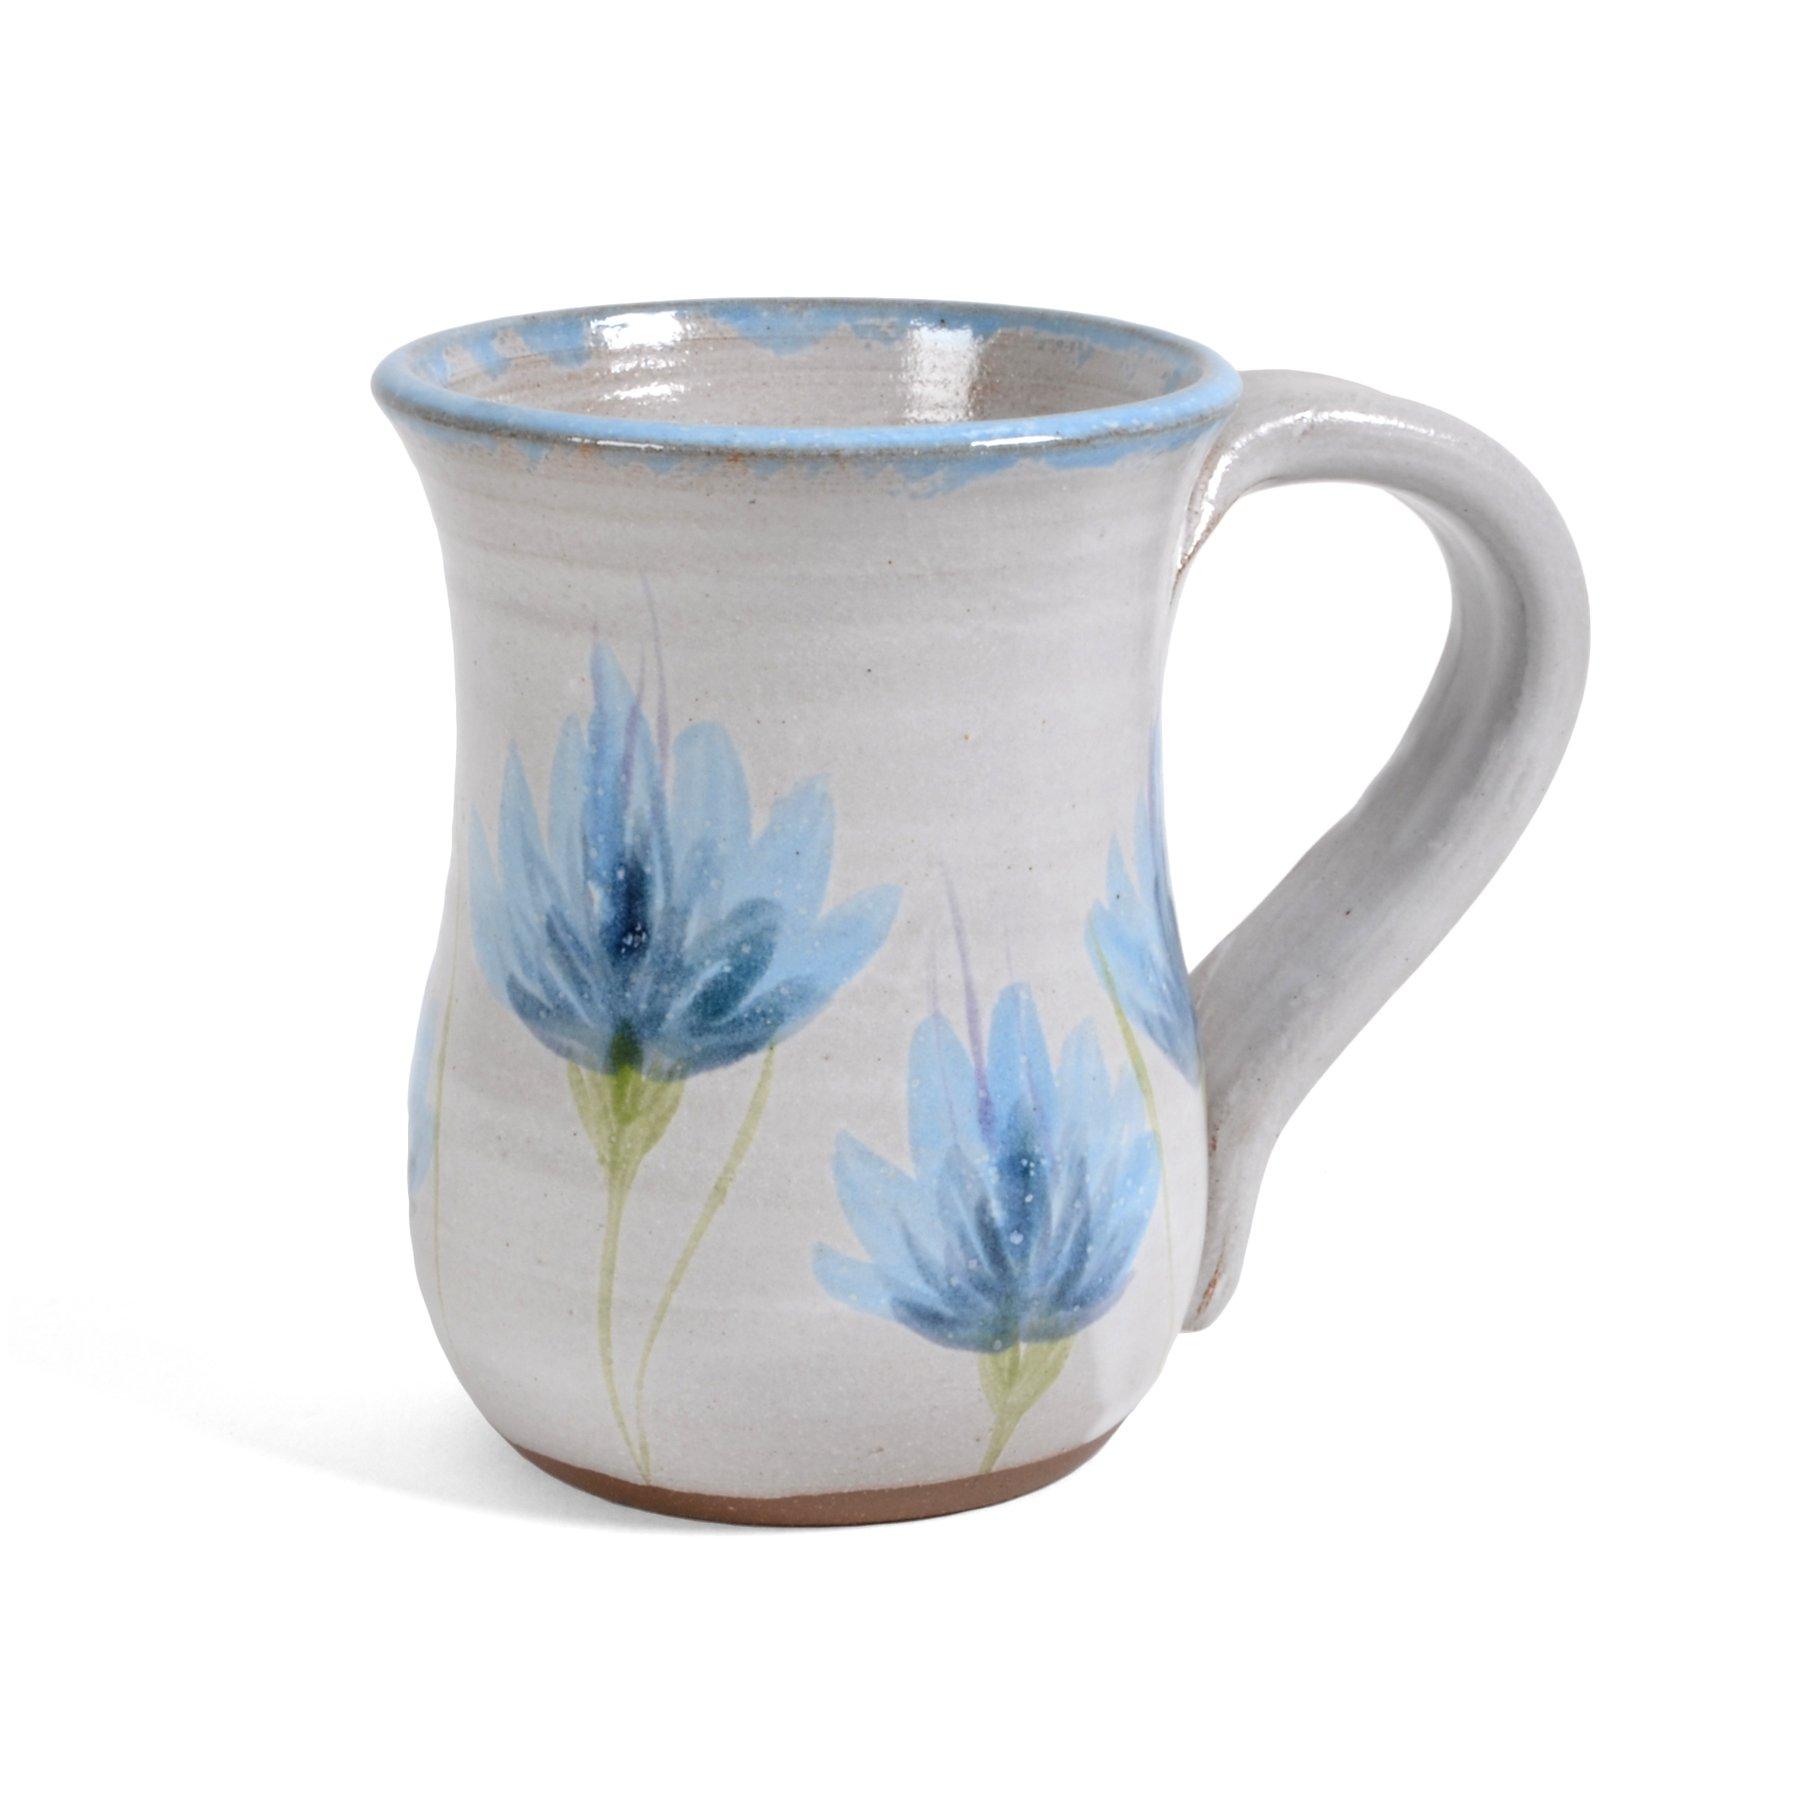 MudWorks Pottery Thistle Mug, Lavender/White